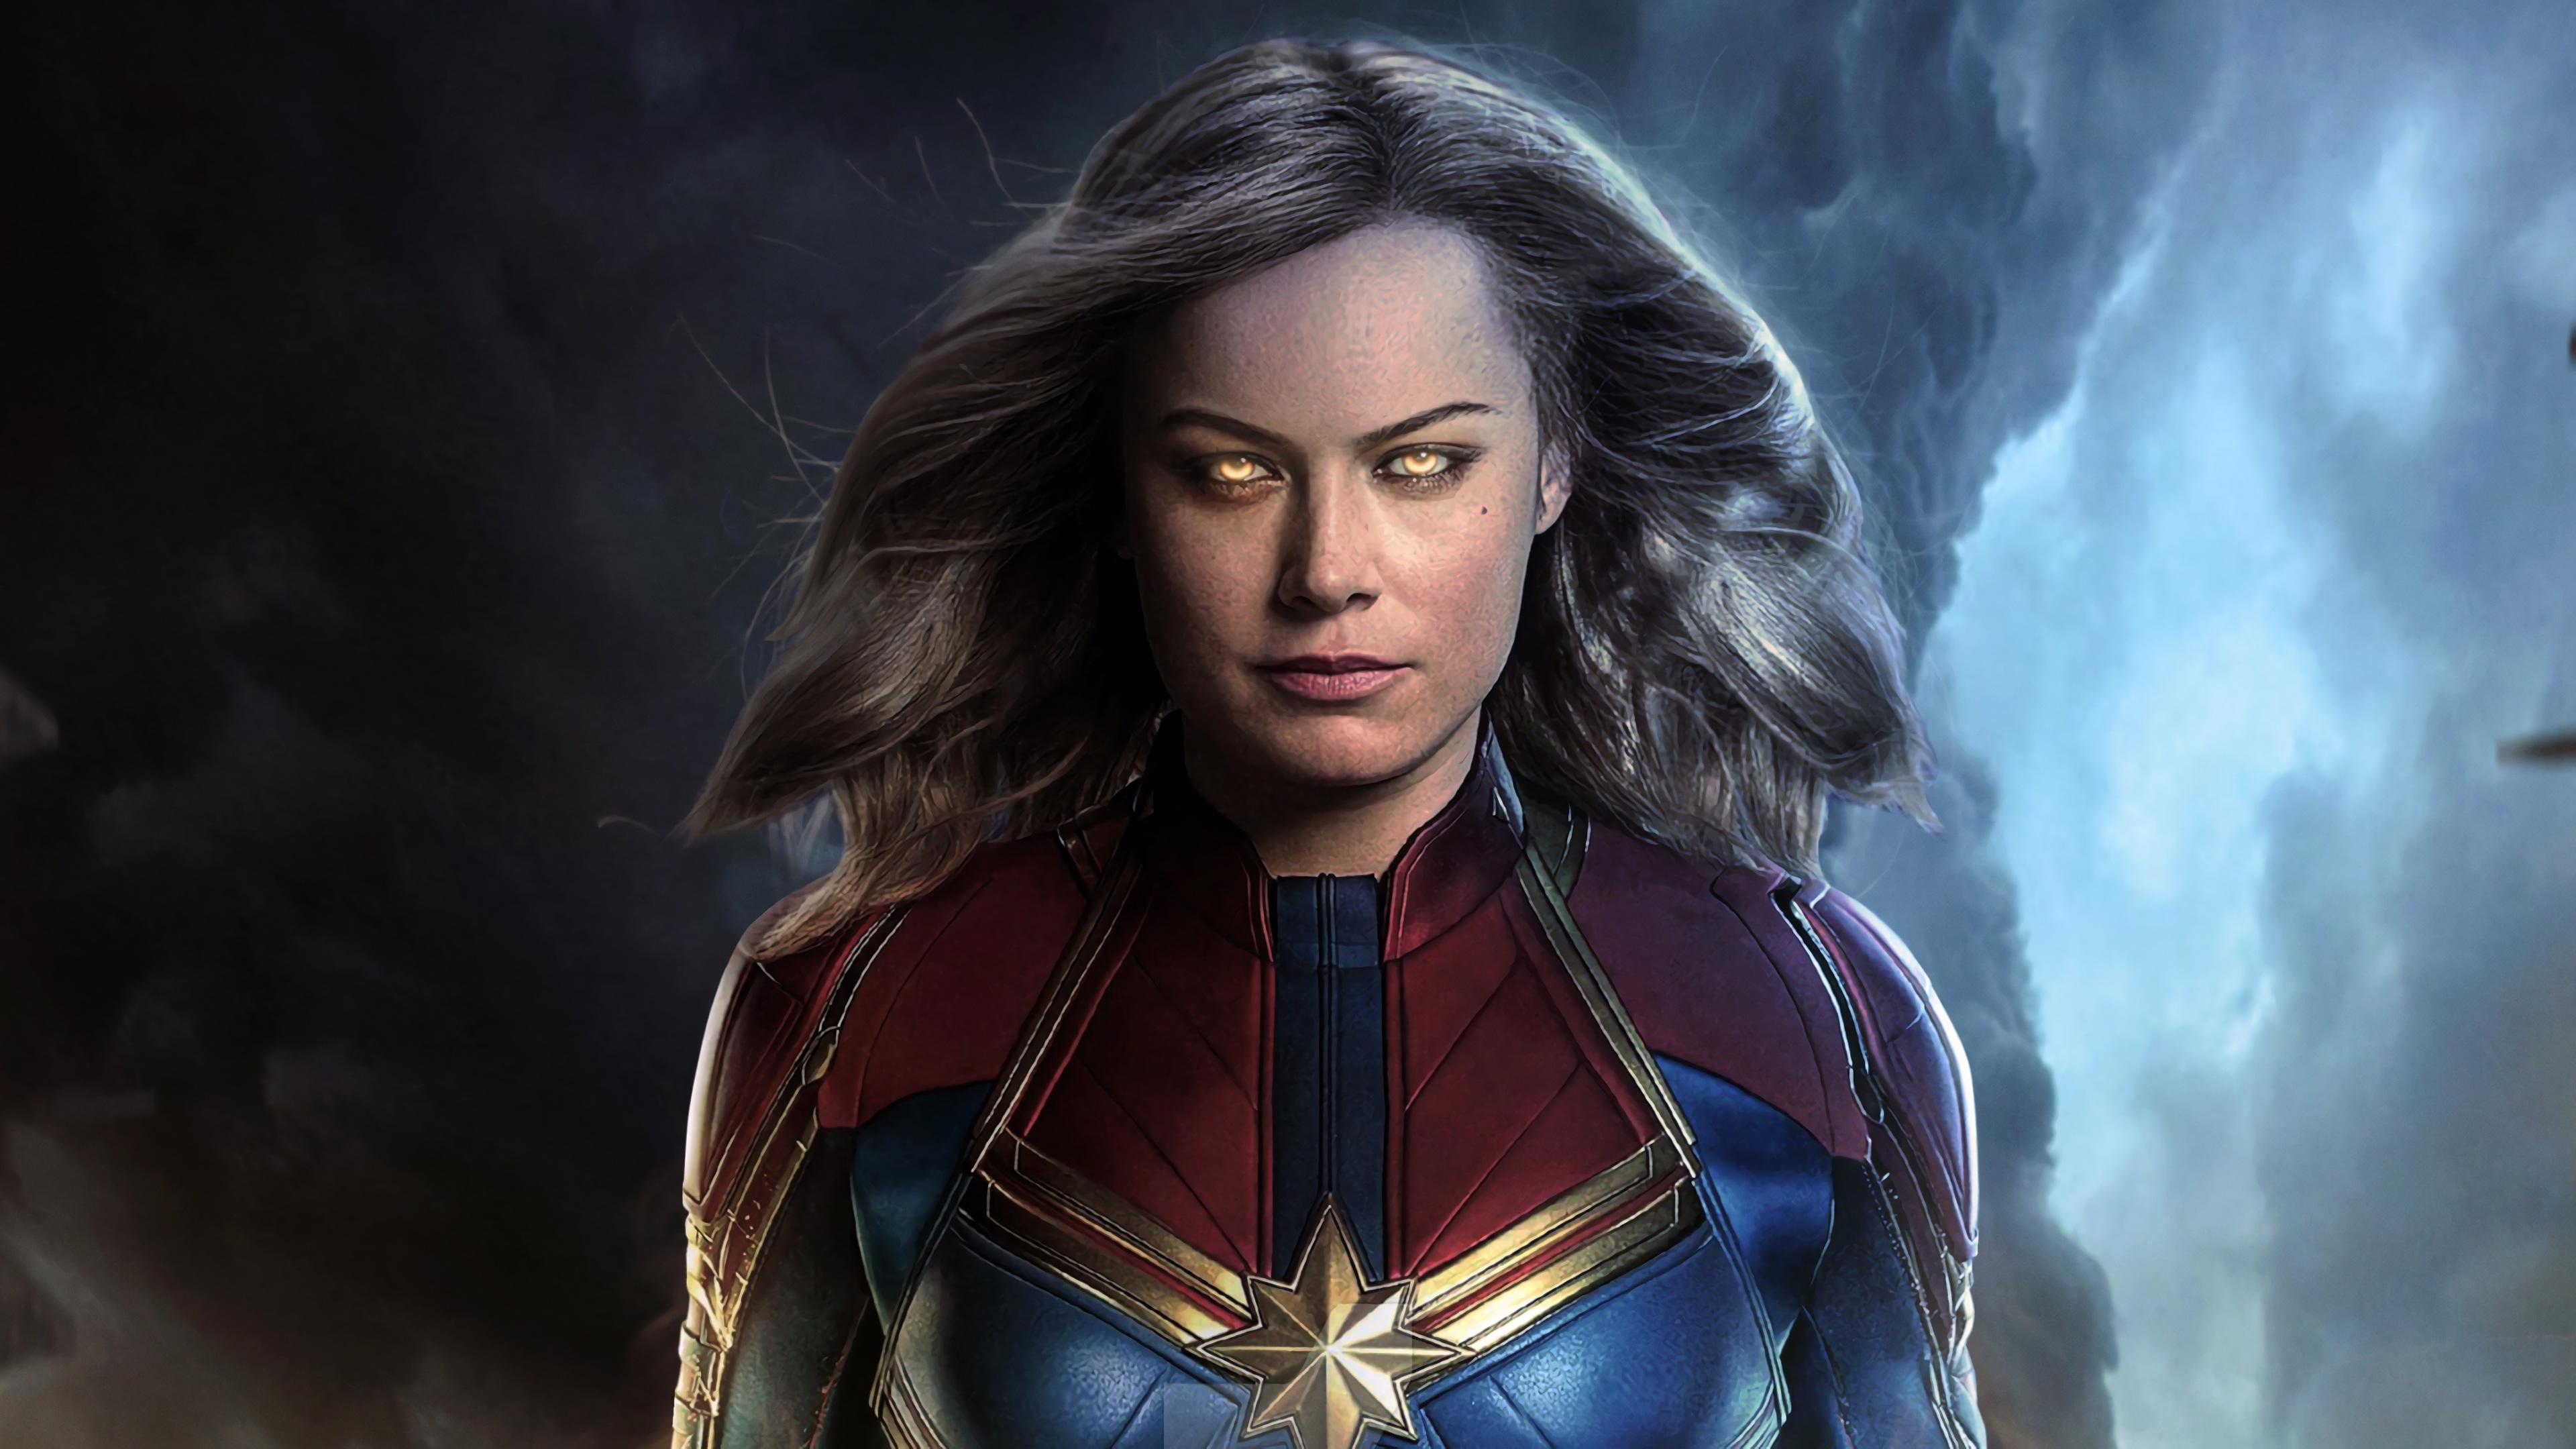 captain marvel movie 2019 brie larson as carol danvers 4k wallpaper 1544829434 - Captain Marvel Movie 2019 Brie Larson as Carol Danvers 4K Wallpaper - Captain Marvel (Movie 2019), Captain Marvel (Carol Danvers)